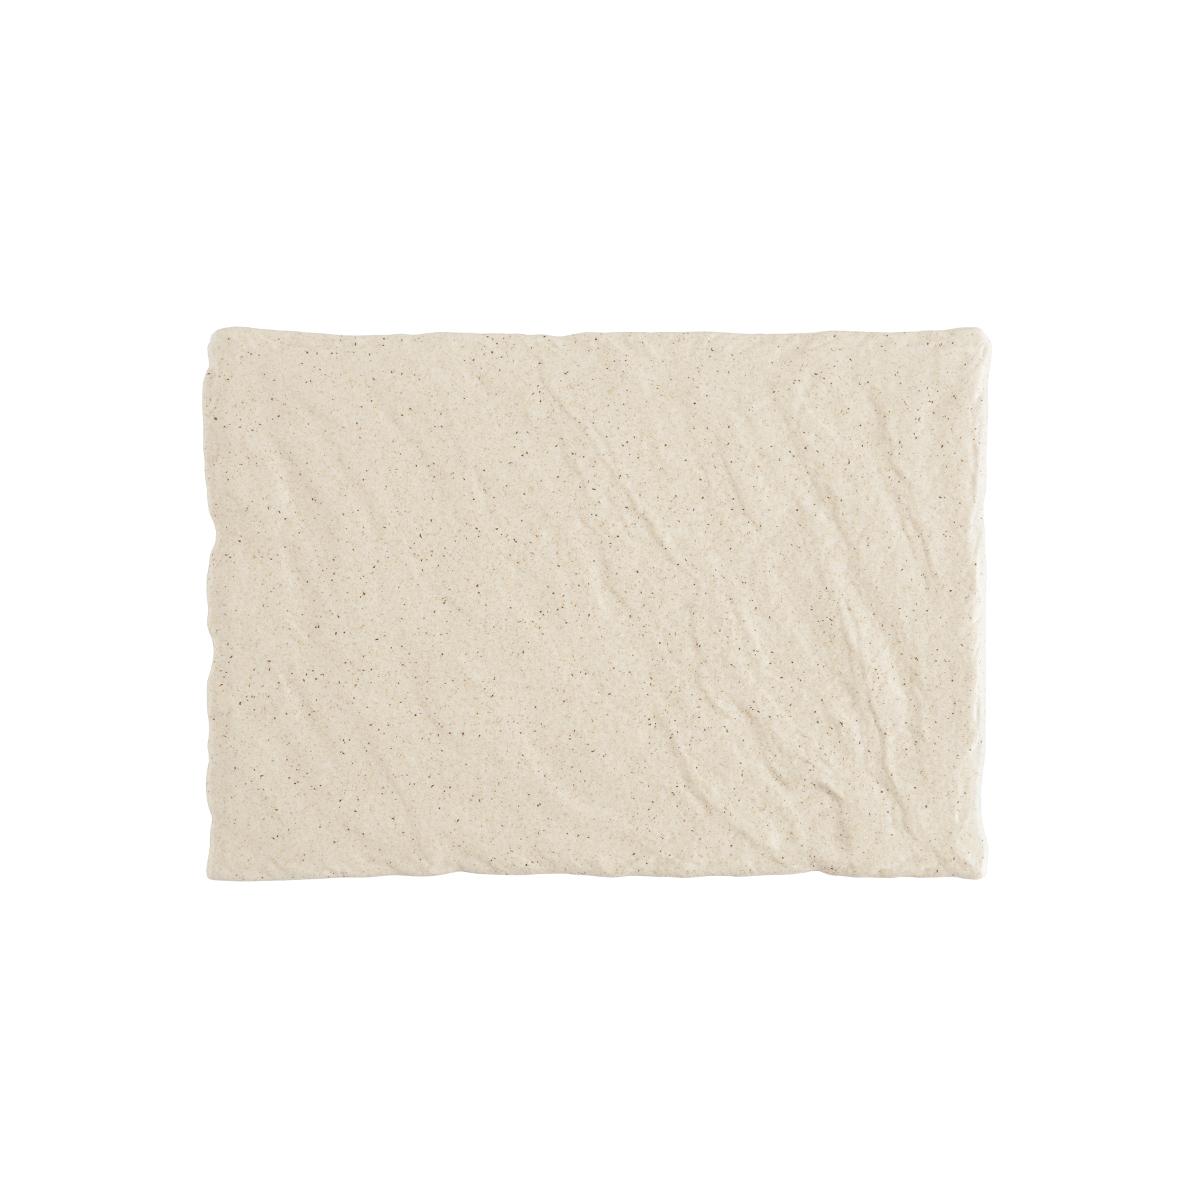 Slayte Fortaluxe Superwhite Sand 2 Piece Rectangular Tray Set